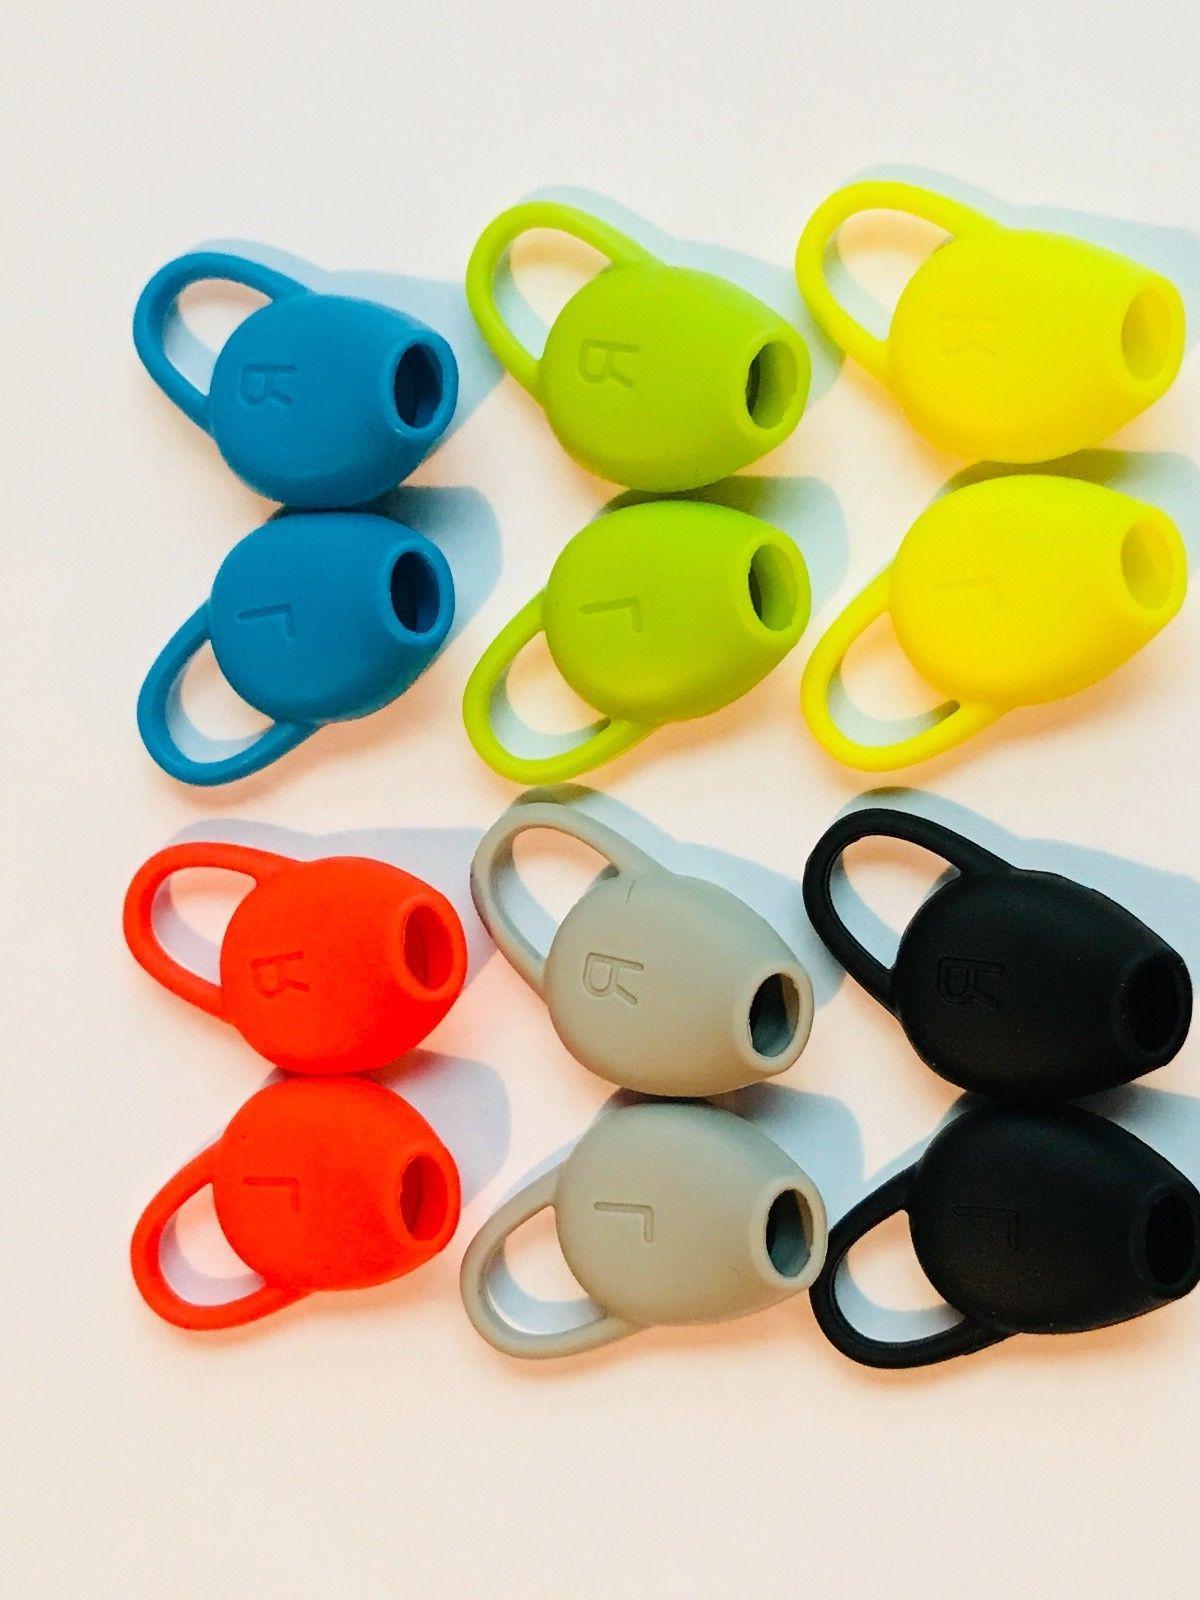 Plantronics Sport Earbud